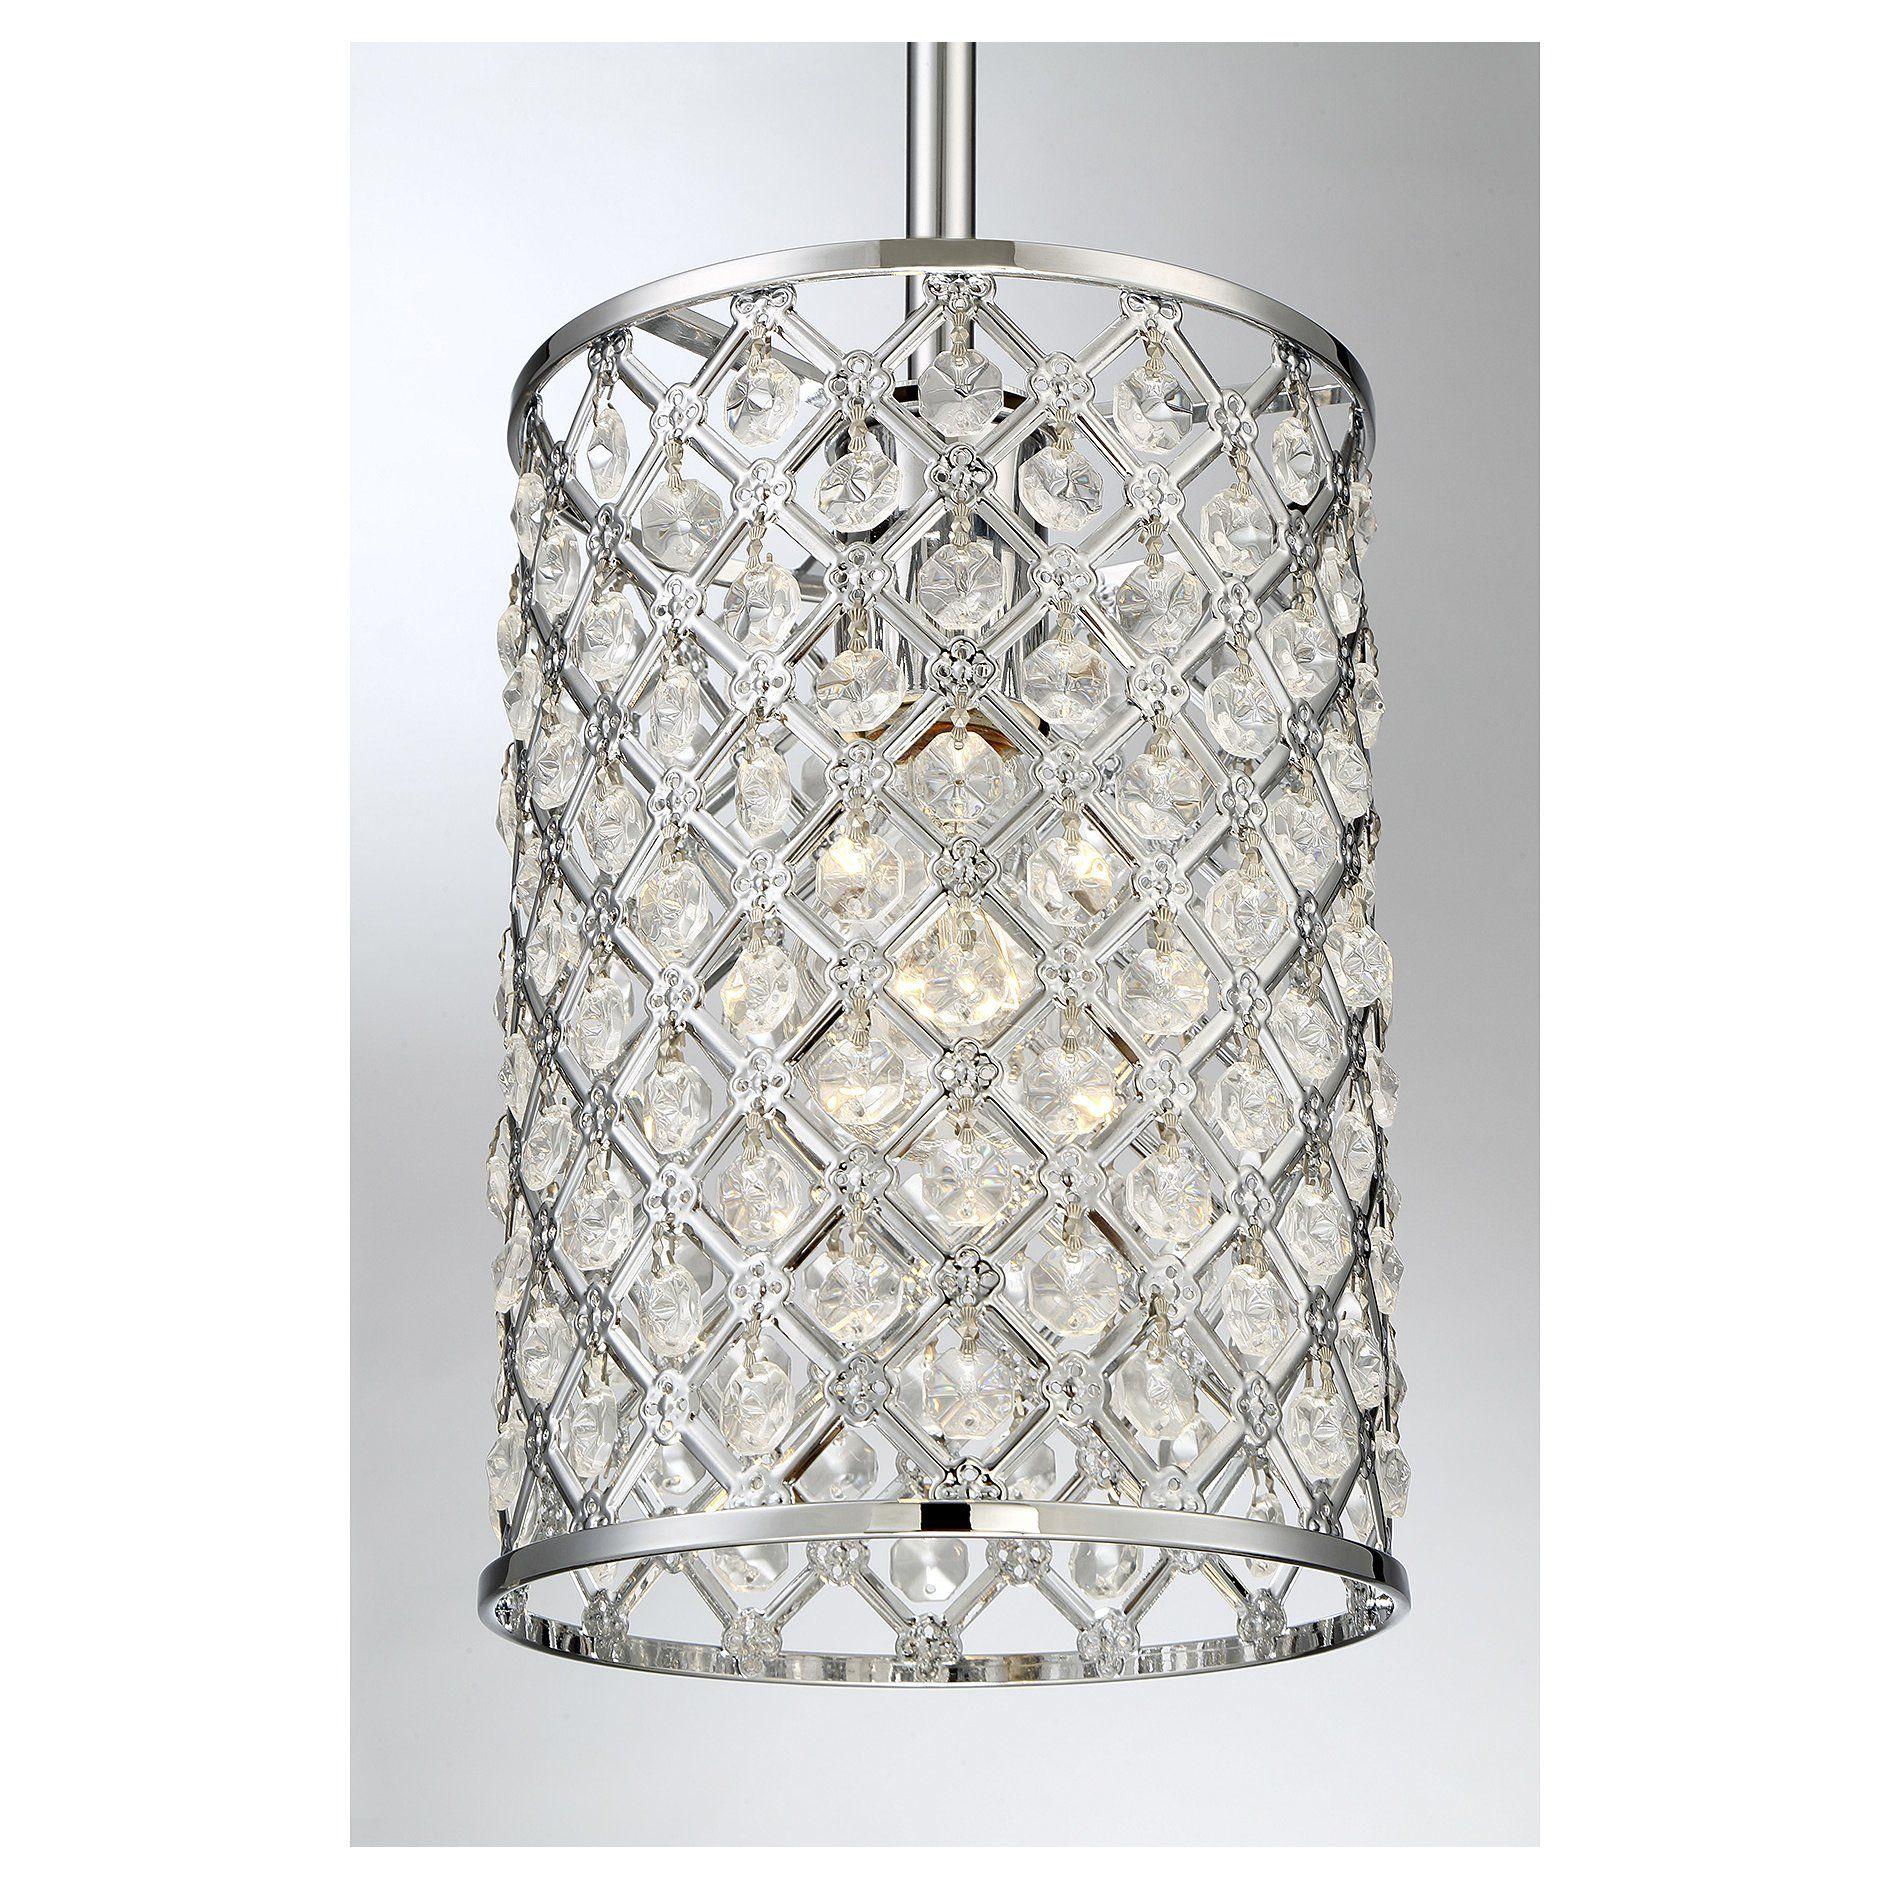 Araujo 1 Light Crystal Pendant | Lighting | Lighting, Mini Within Hurst 1 Light Single Cylinder Pendants (View 6 of 30)